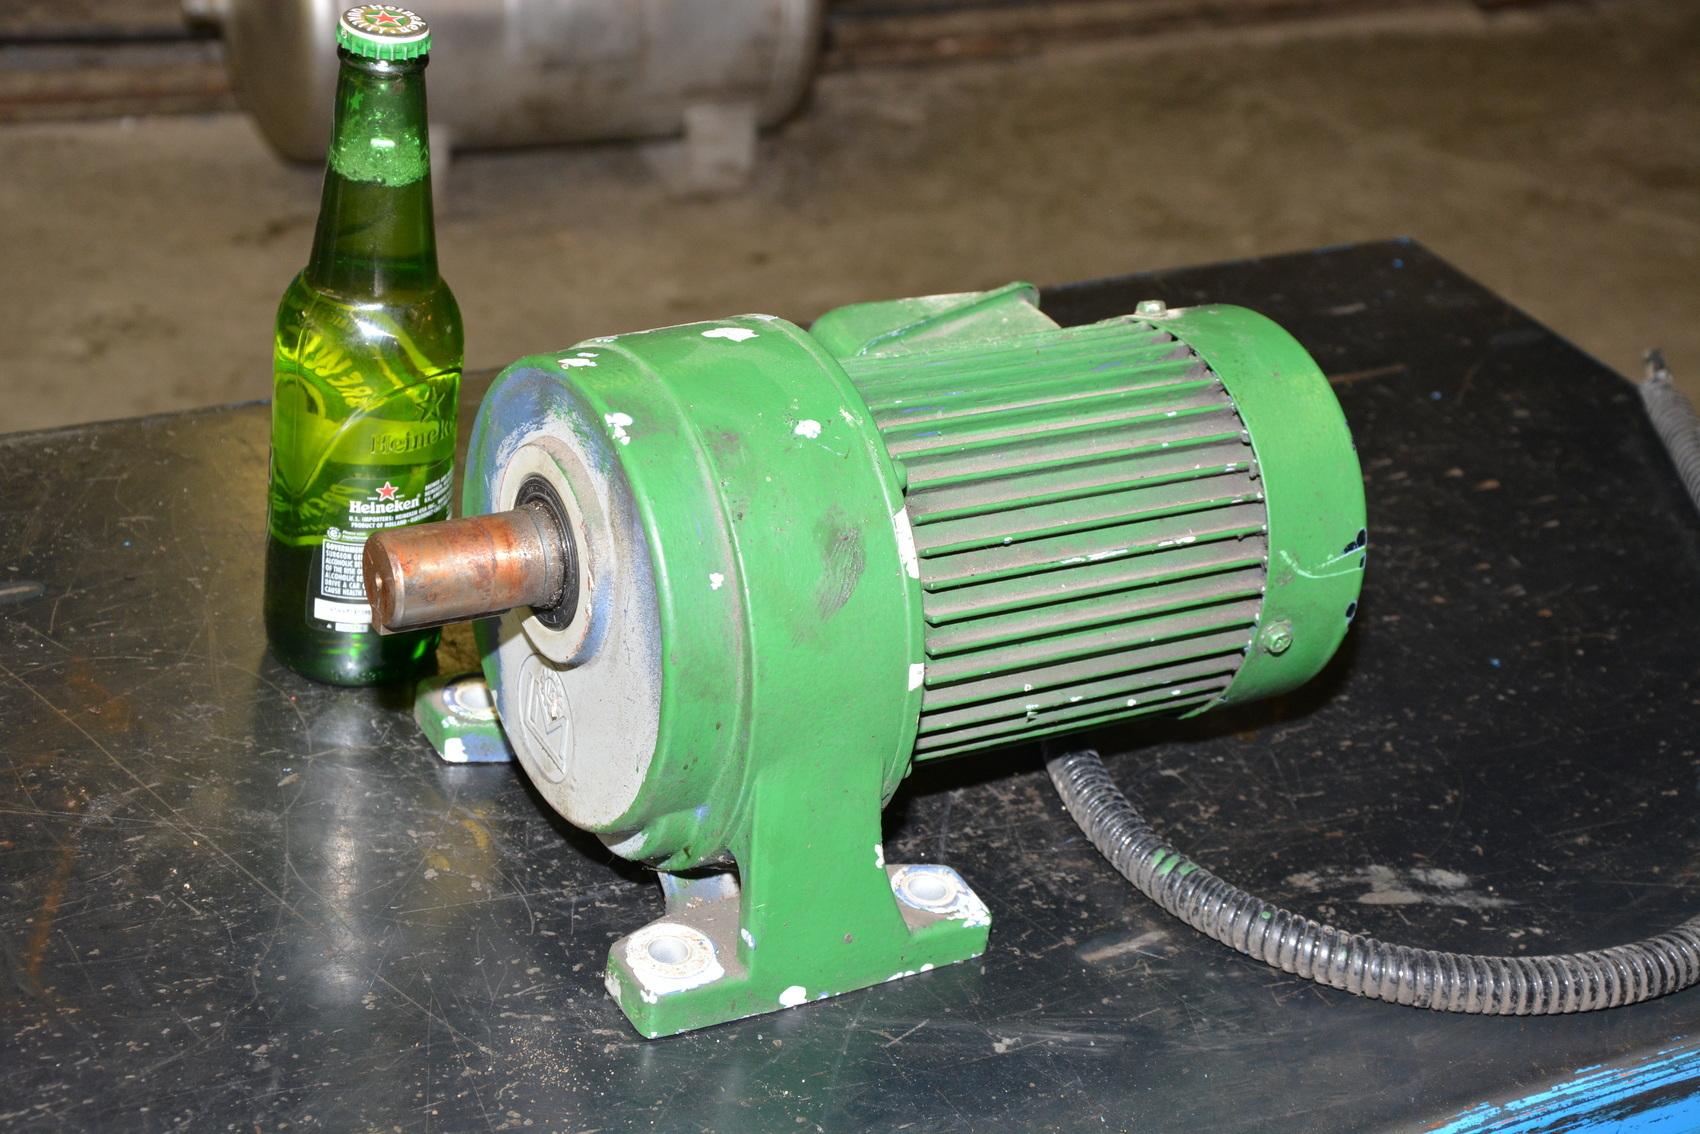 Liming Sh 12 Gear Motor Reducer Ratio 1 165 8 10 Rpm 0 2